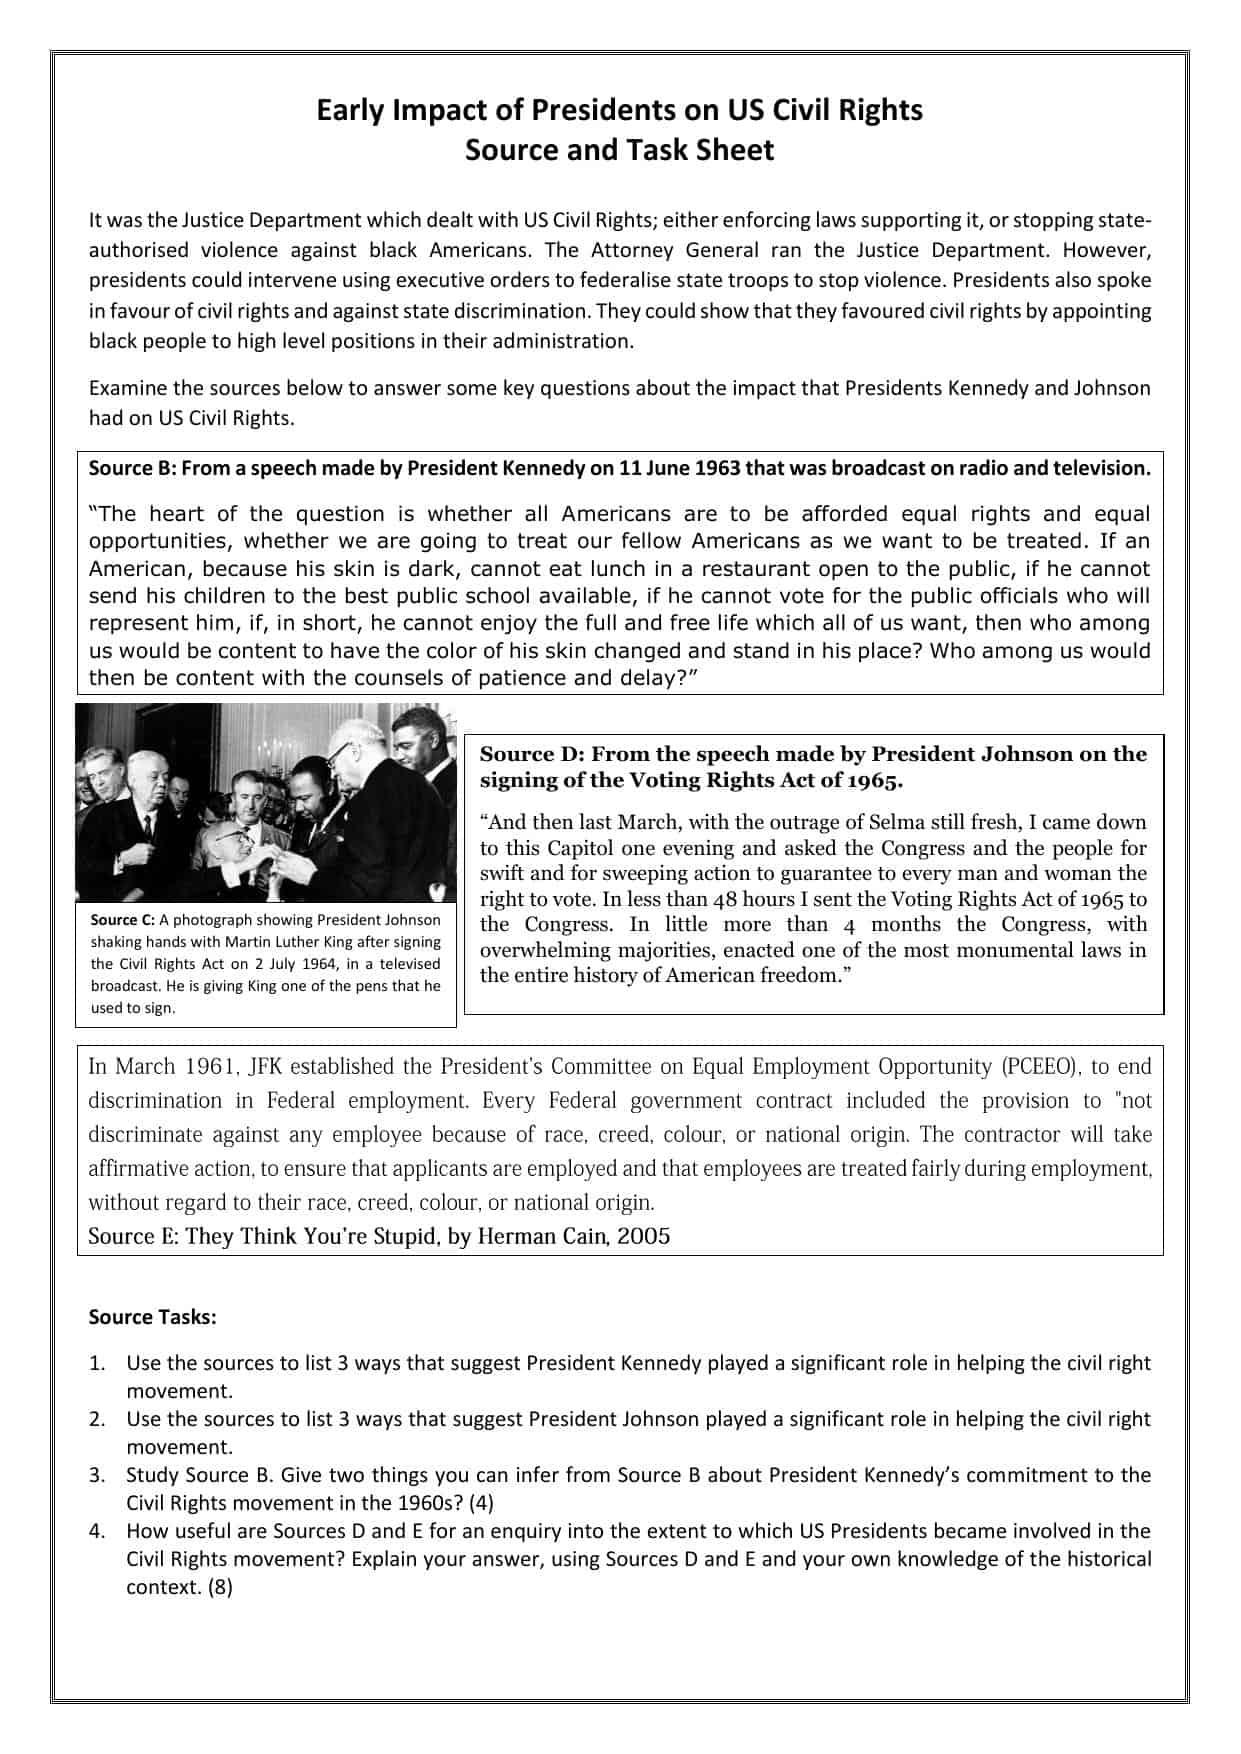 Fun college application essay prompts